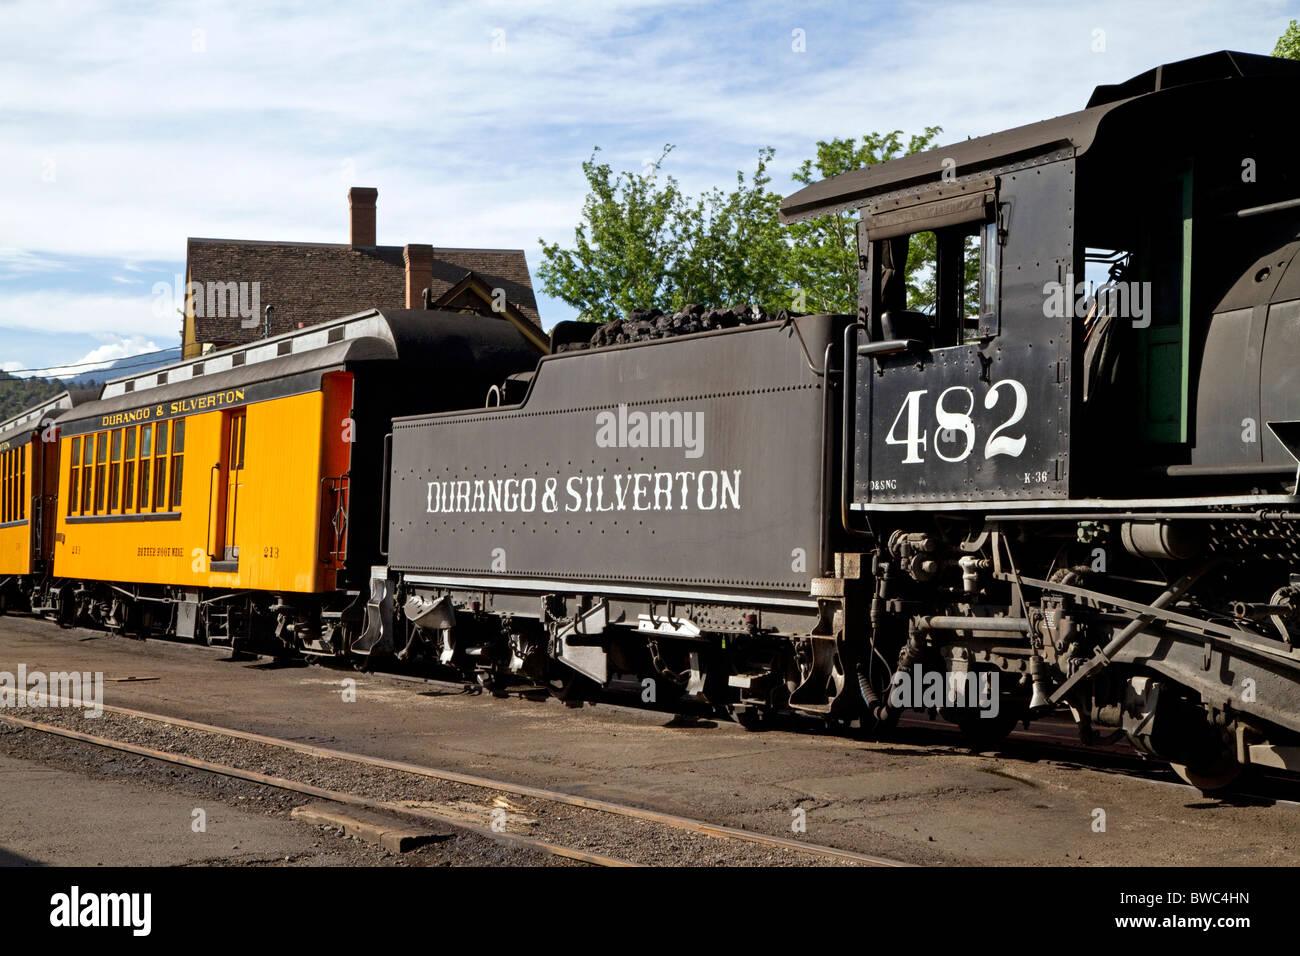 Steam locomotive on the Durango and Silverton Narrow Gauge Railroad located in Durango, Colorado, USA. - Stock Image